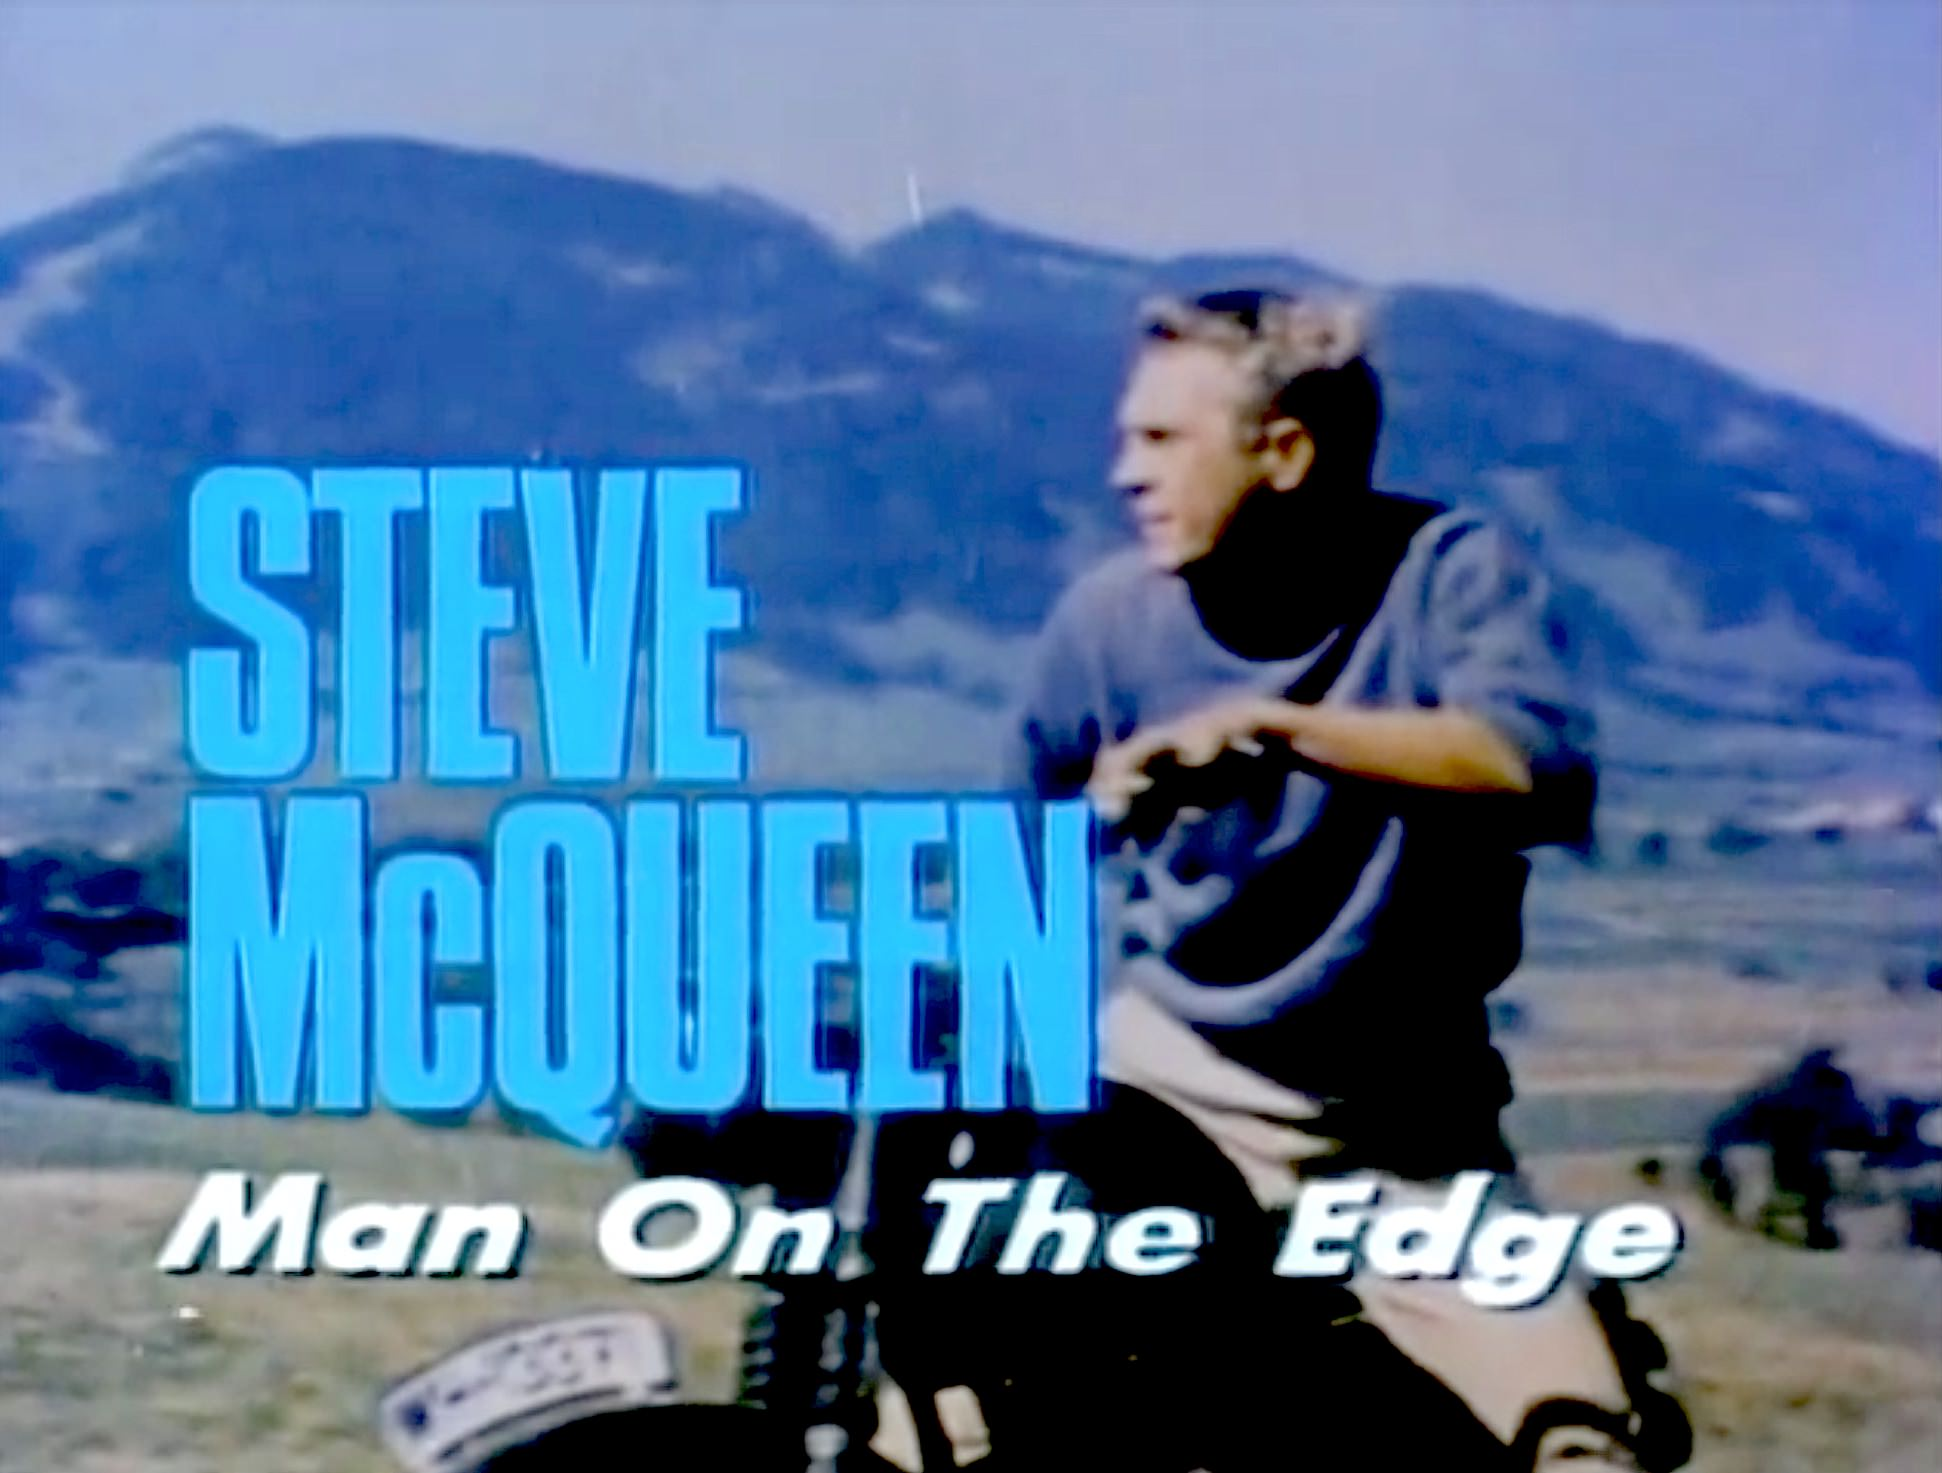 American Car Brands >> Documentary: Steve McQueen - Man On The Edge